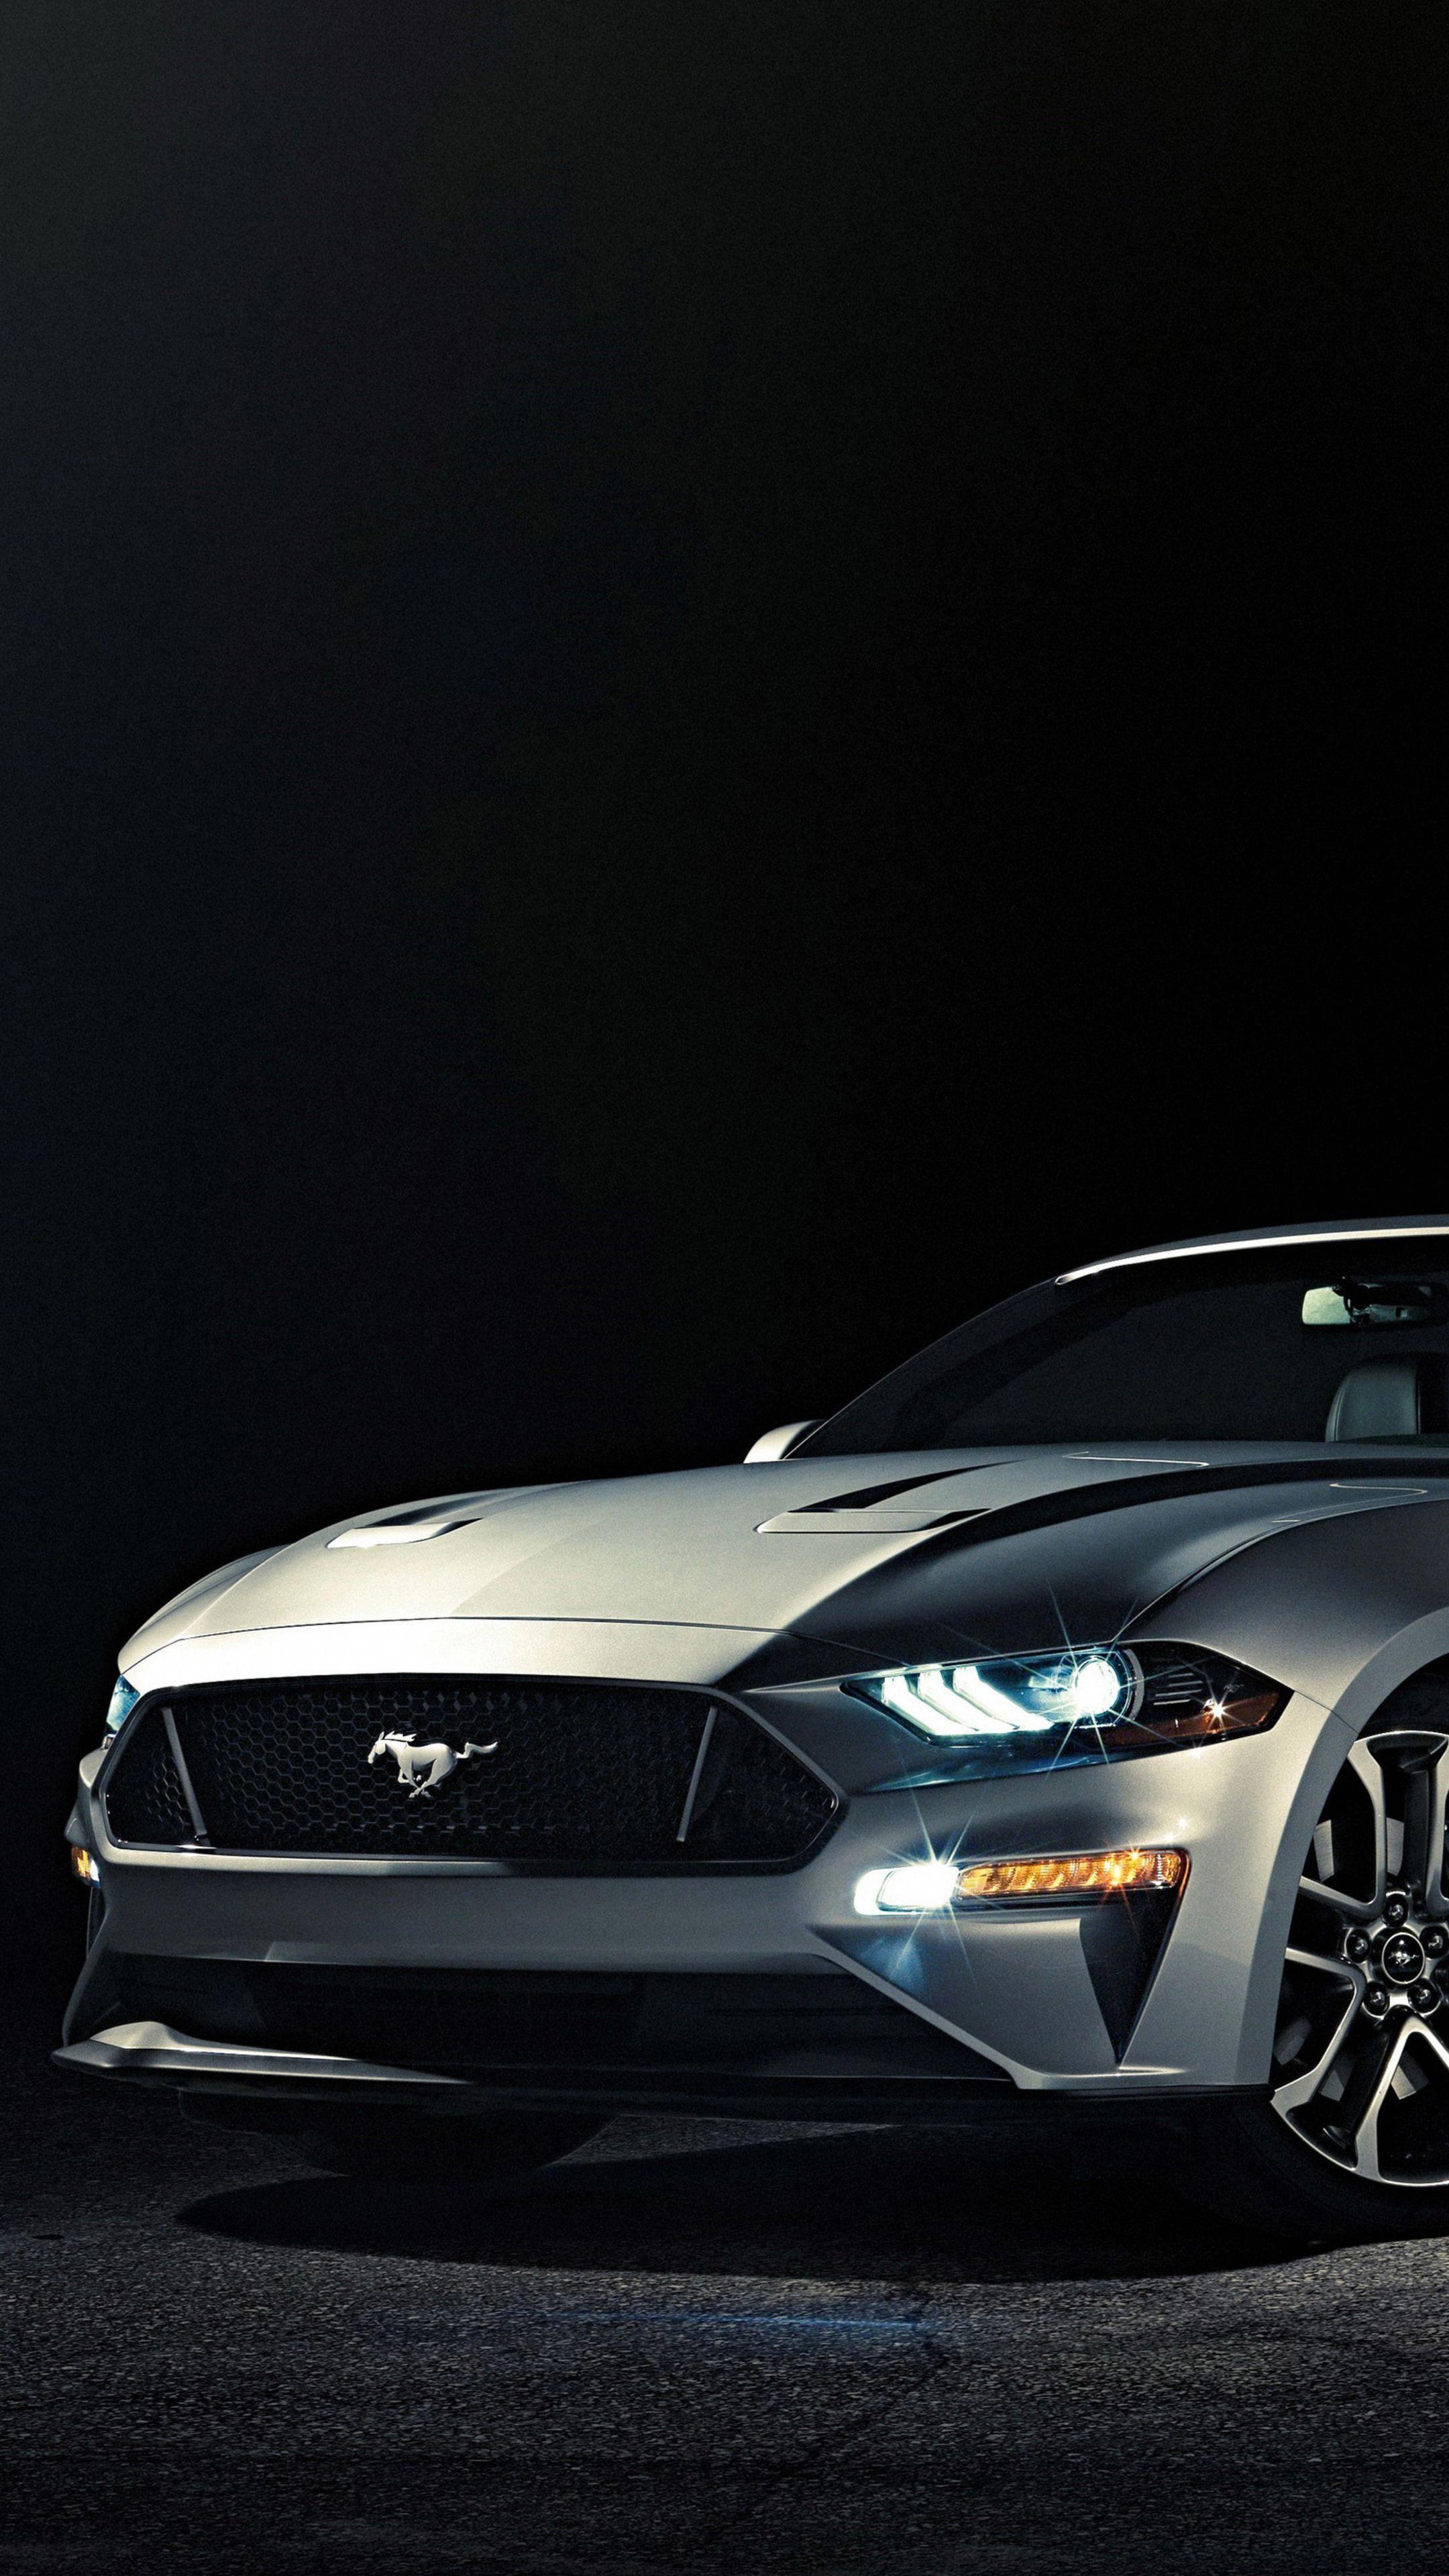 Pin By Lohiya K On Cars In 2020 Mustang Cars Mustang Wallpaper